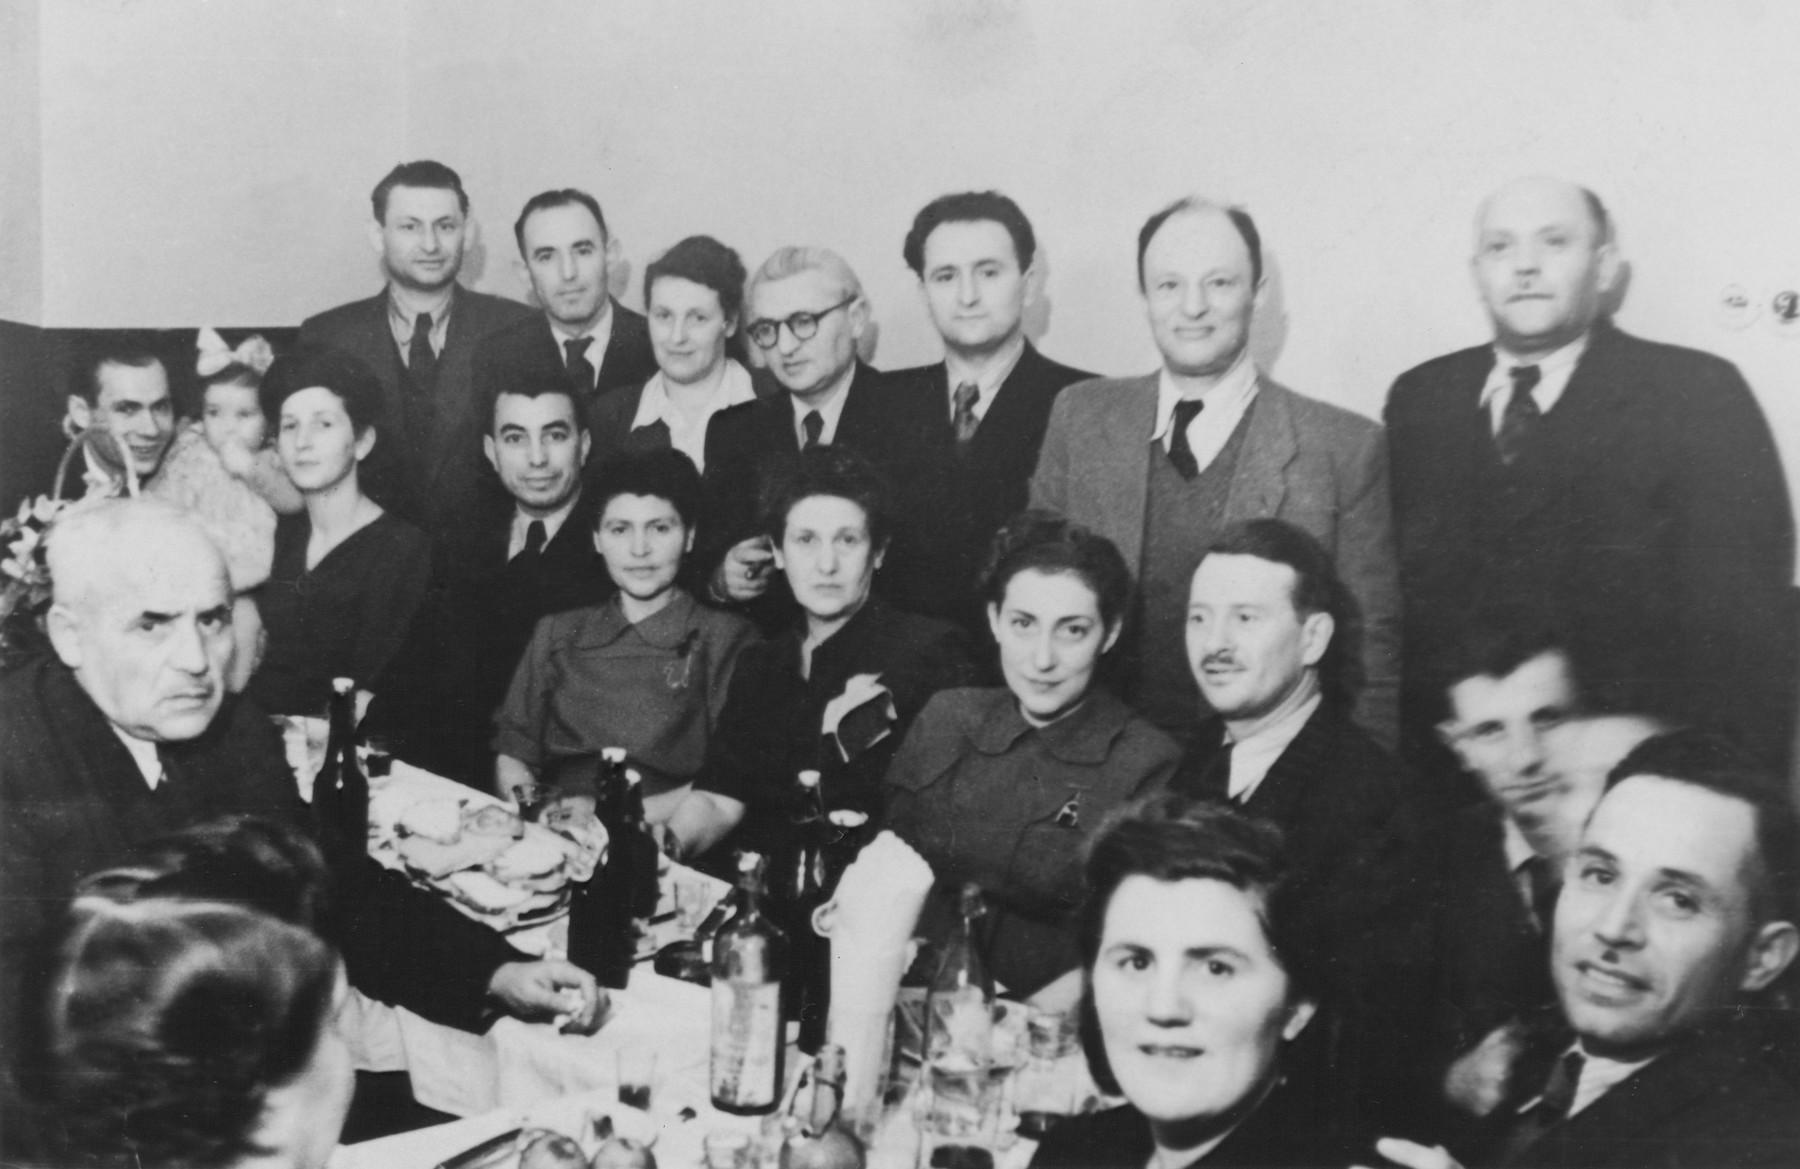 Jewish survivors froem Skierniewice at a social gathering in Lodz.